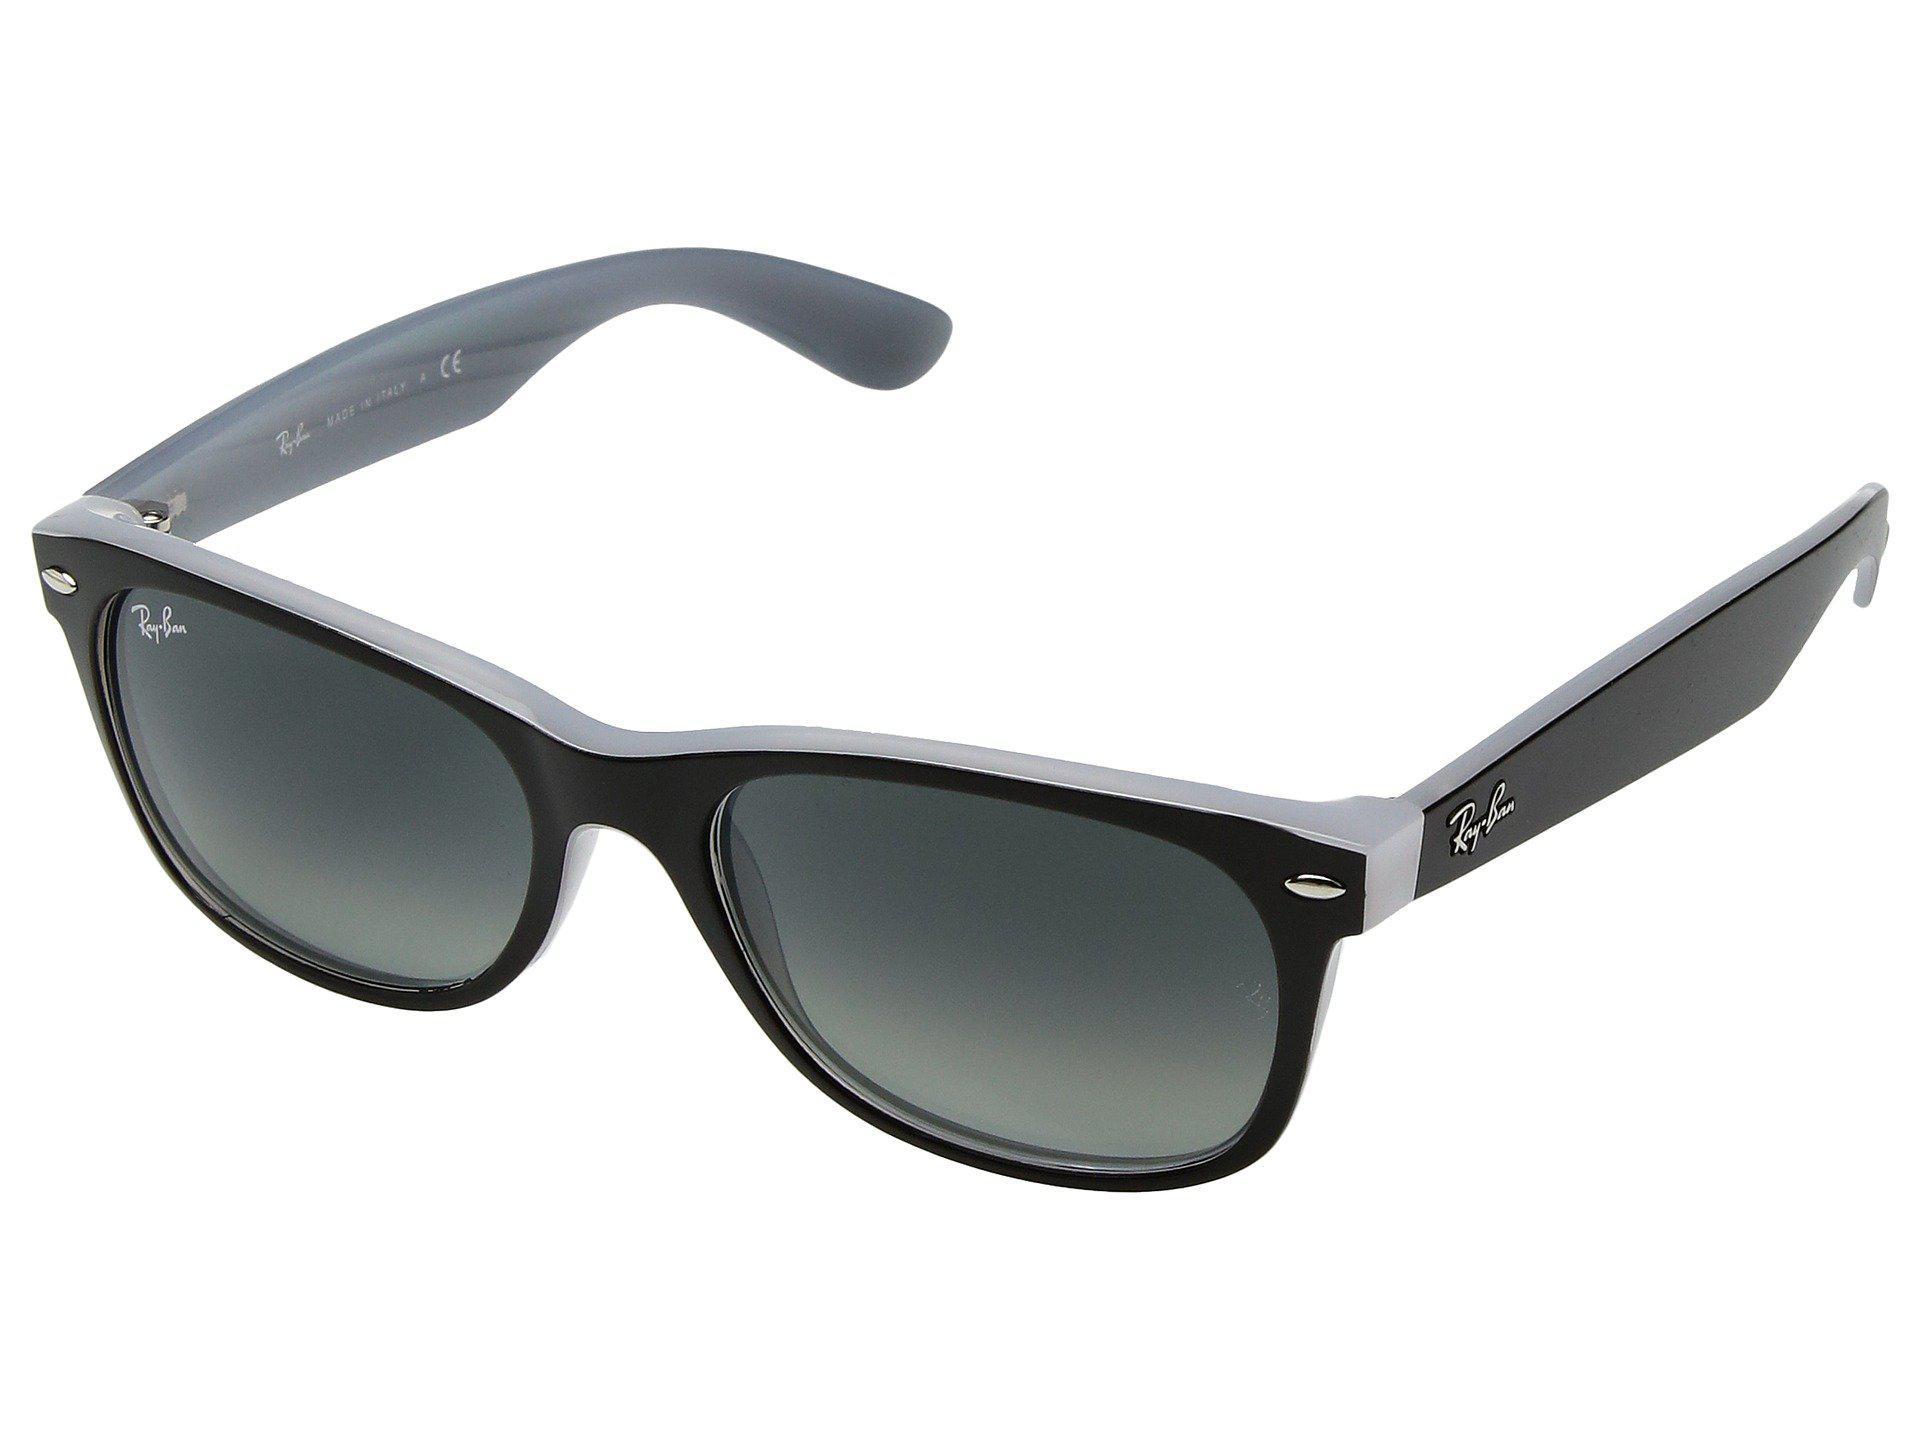 d0a01e4c499 Ray-Ban. Men s Rb2132 New Wayfarer 55mm (black g-15 Xlt Lens) Fashion  Sunglasses